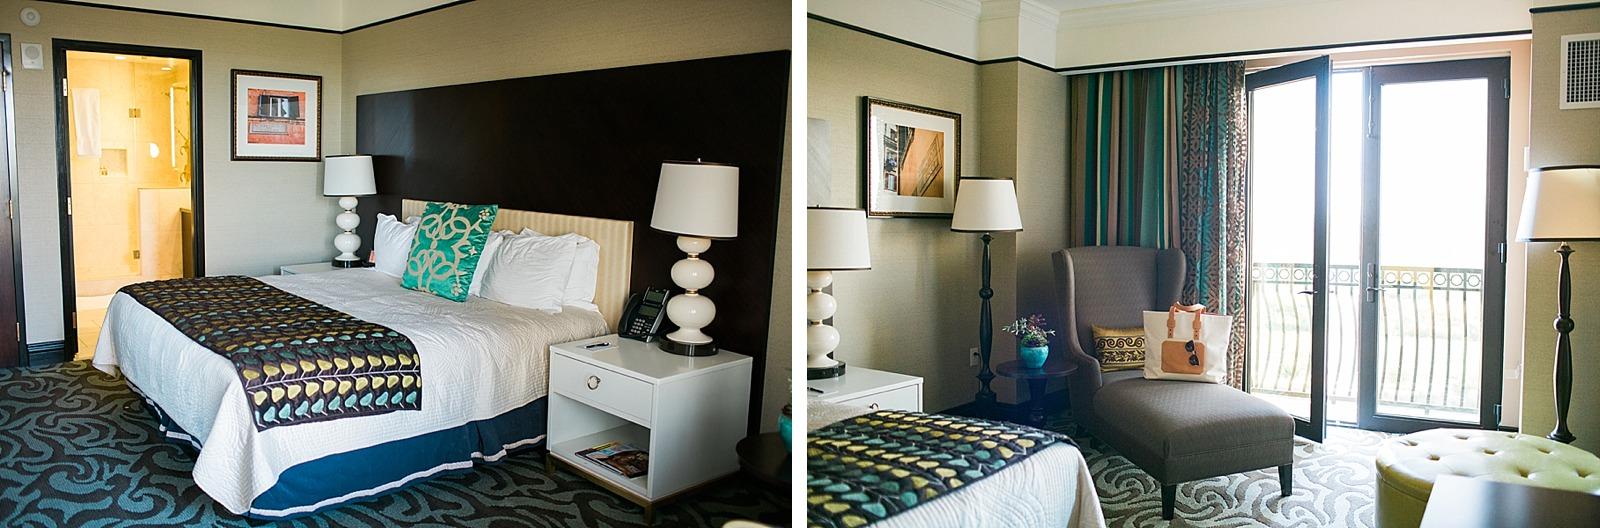 casino-del-sol-hotel-tucson-review-stay-diana-elizabeth-blog_0003